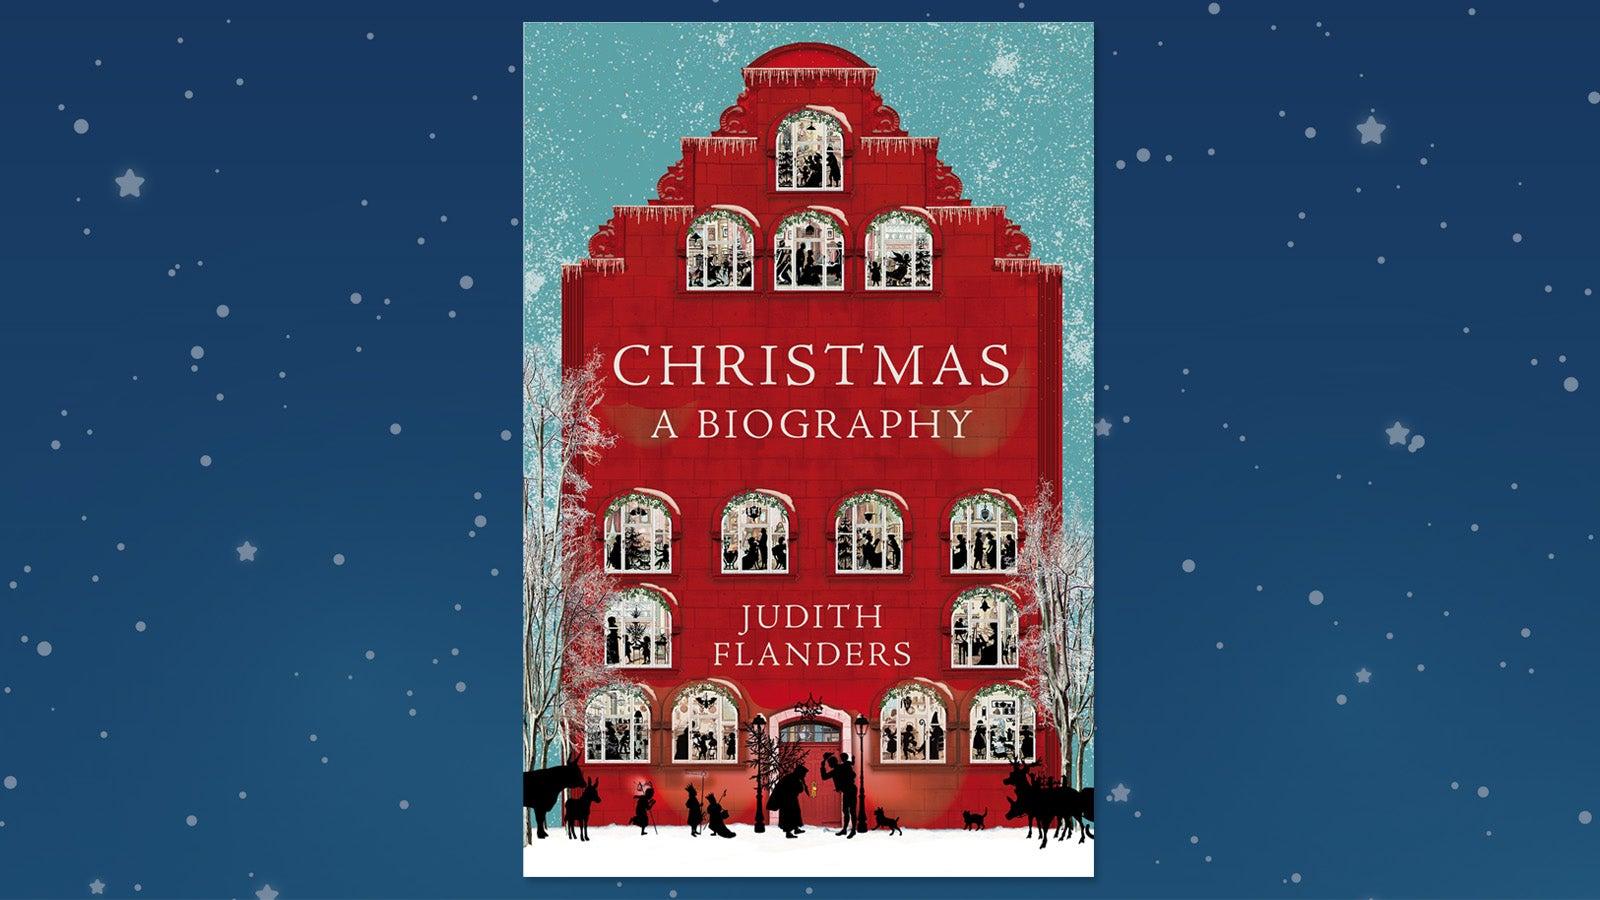 christmas-biography-header-book-traditions.jpg